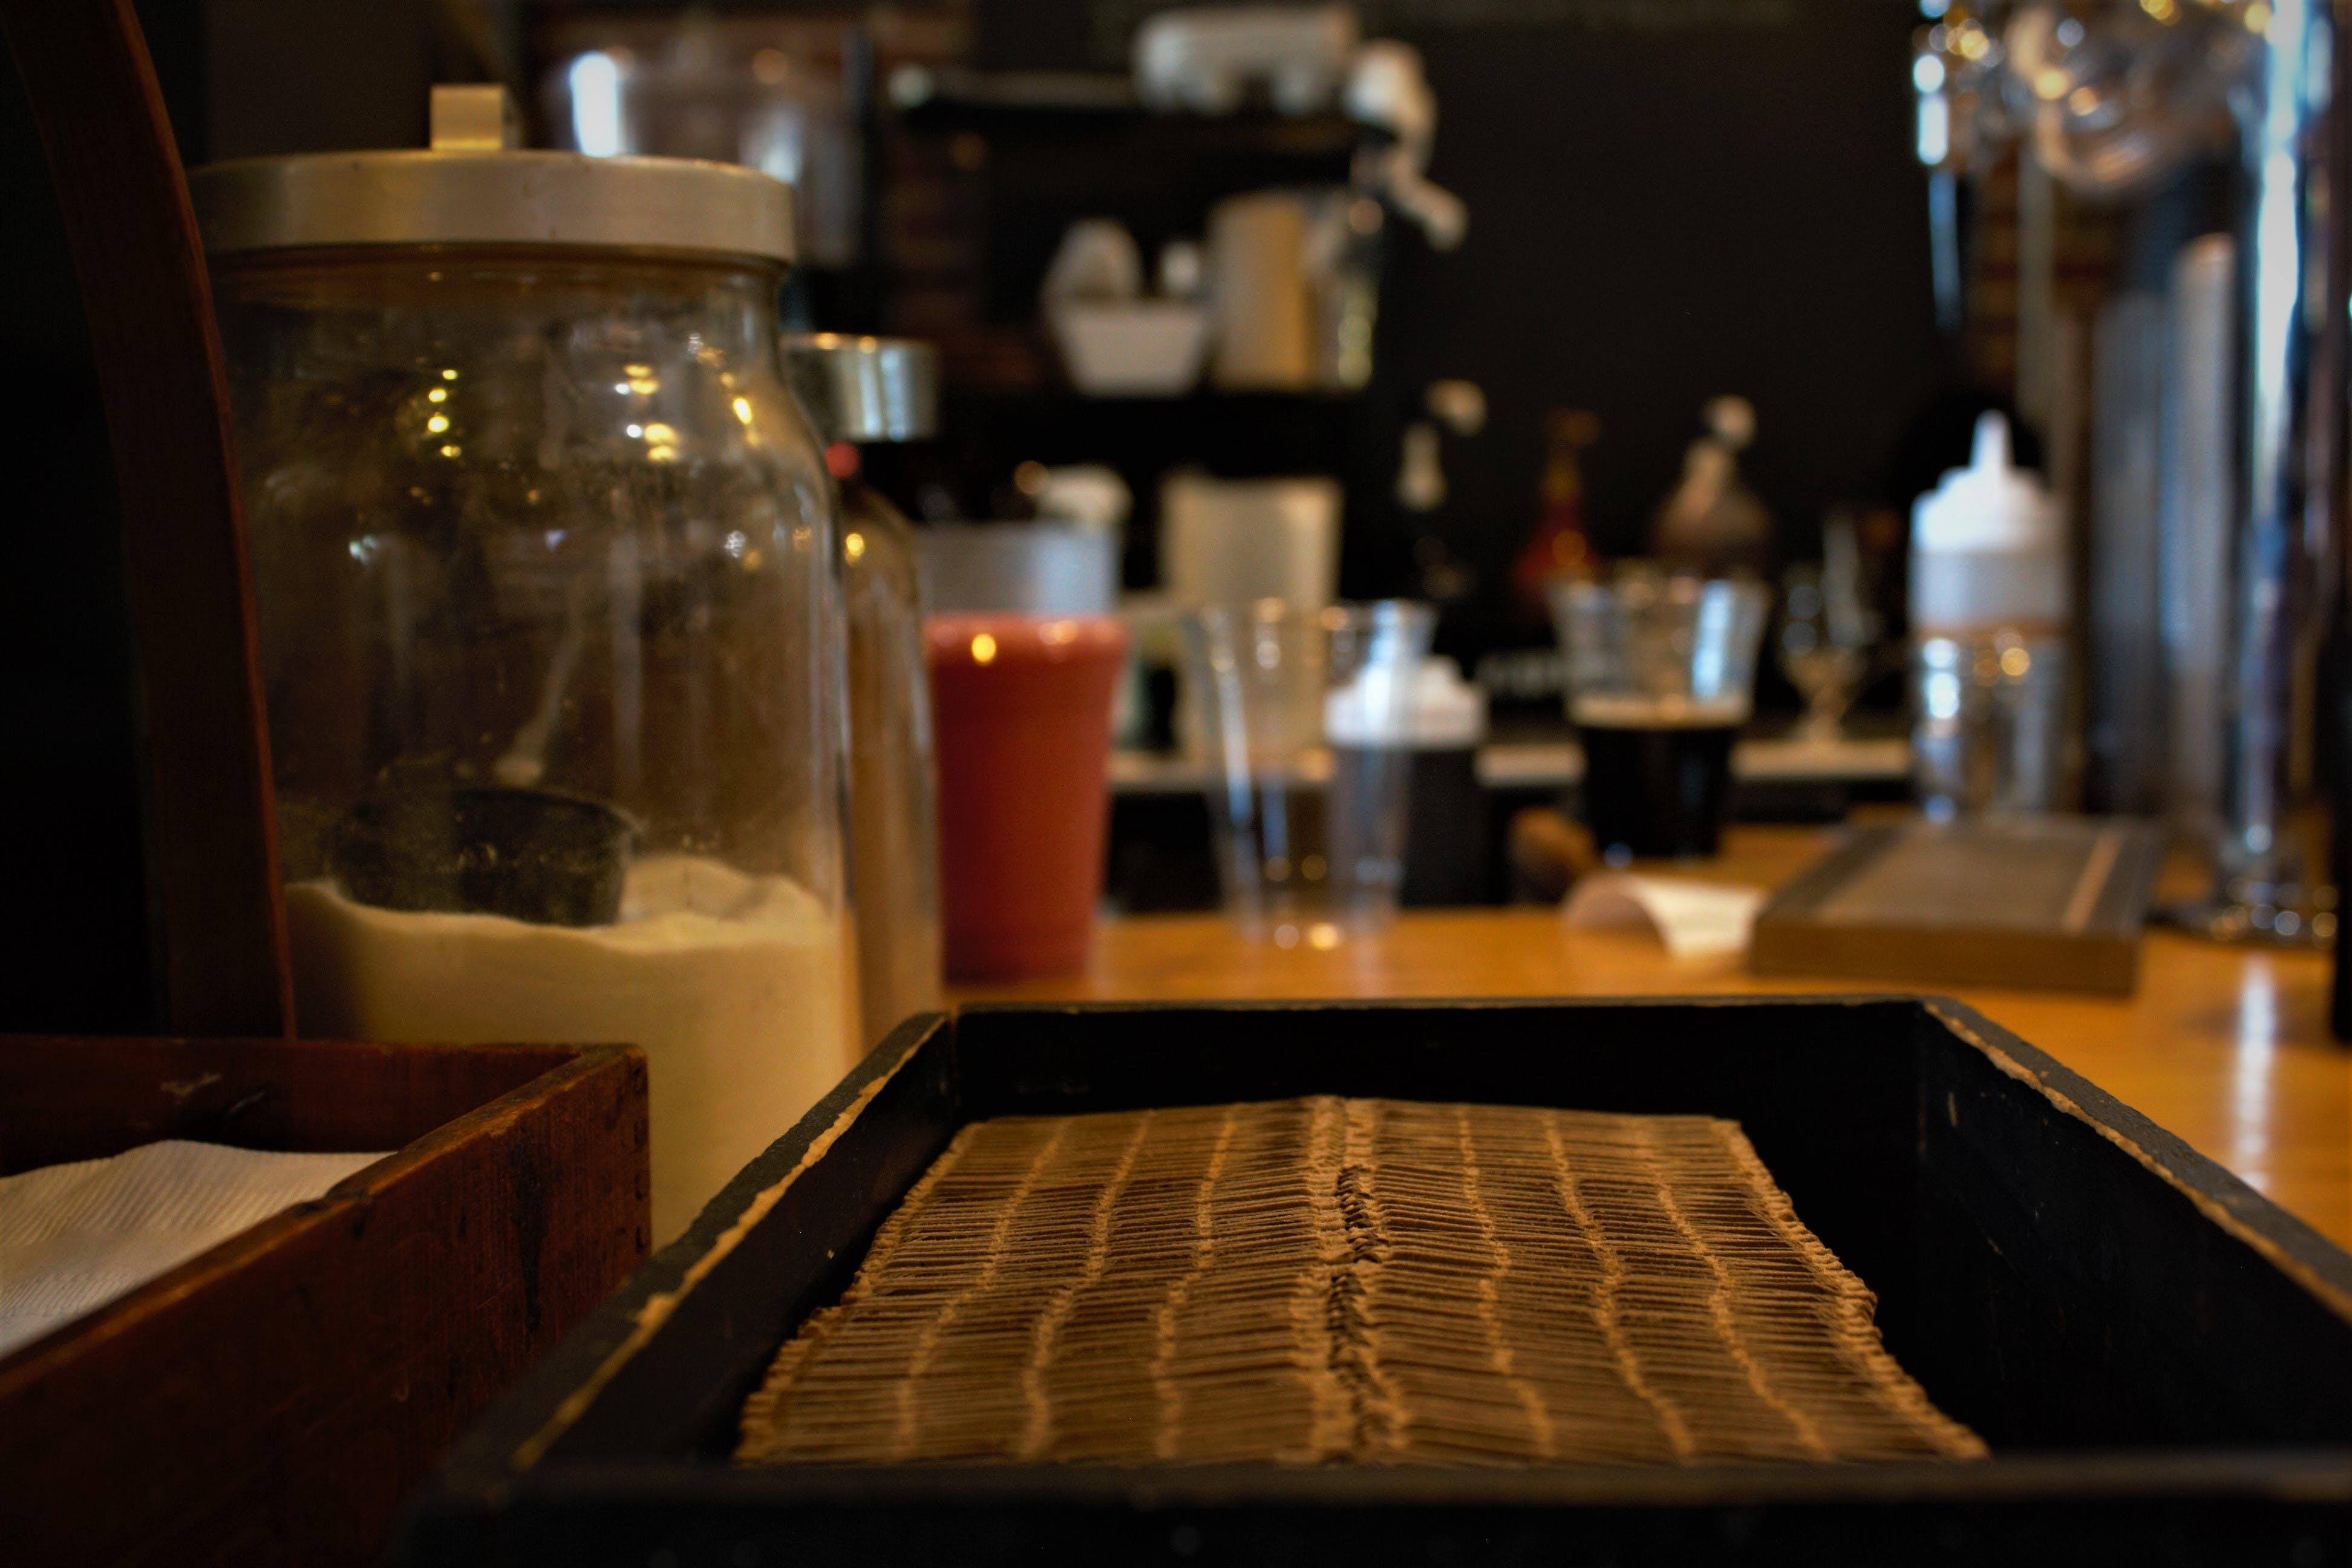 Free stock photo of äste, coffee, coffee shop, exquisite taste